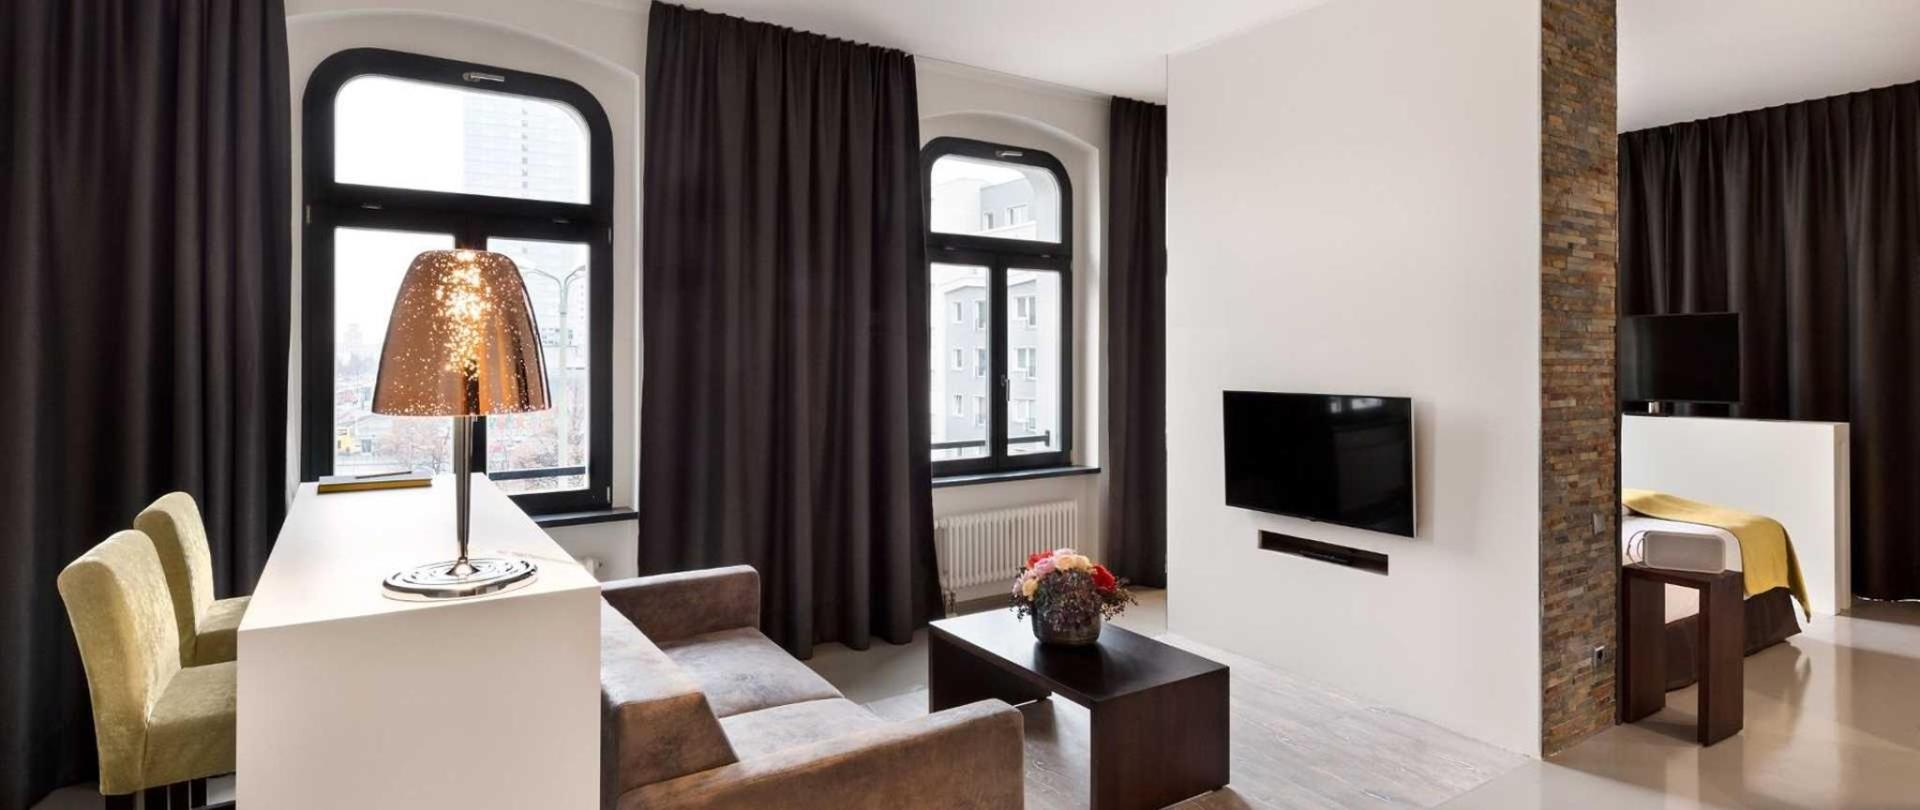 lux 11 berlin mitte berlin germany. Black Bedroom Furniture Sets. Home Design Ideas